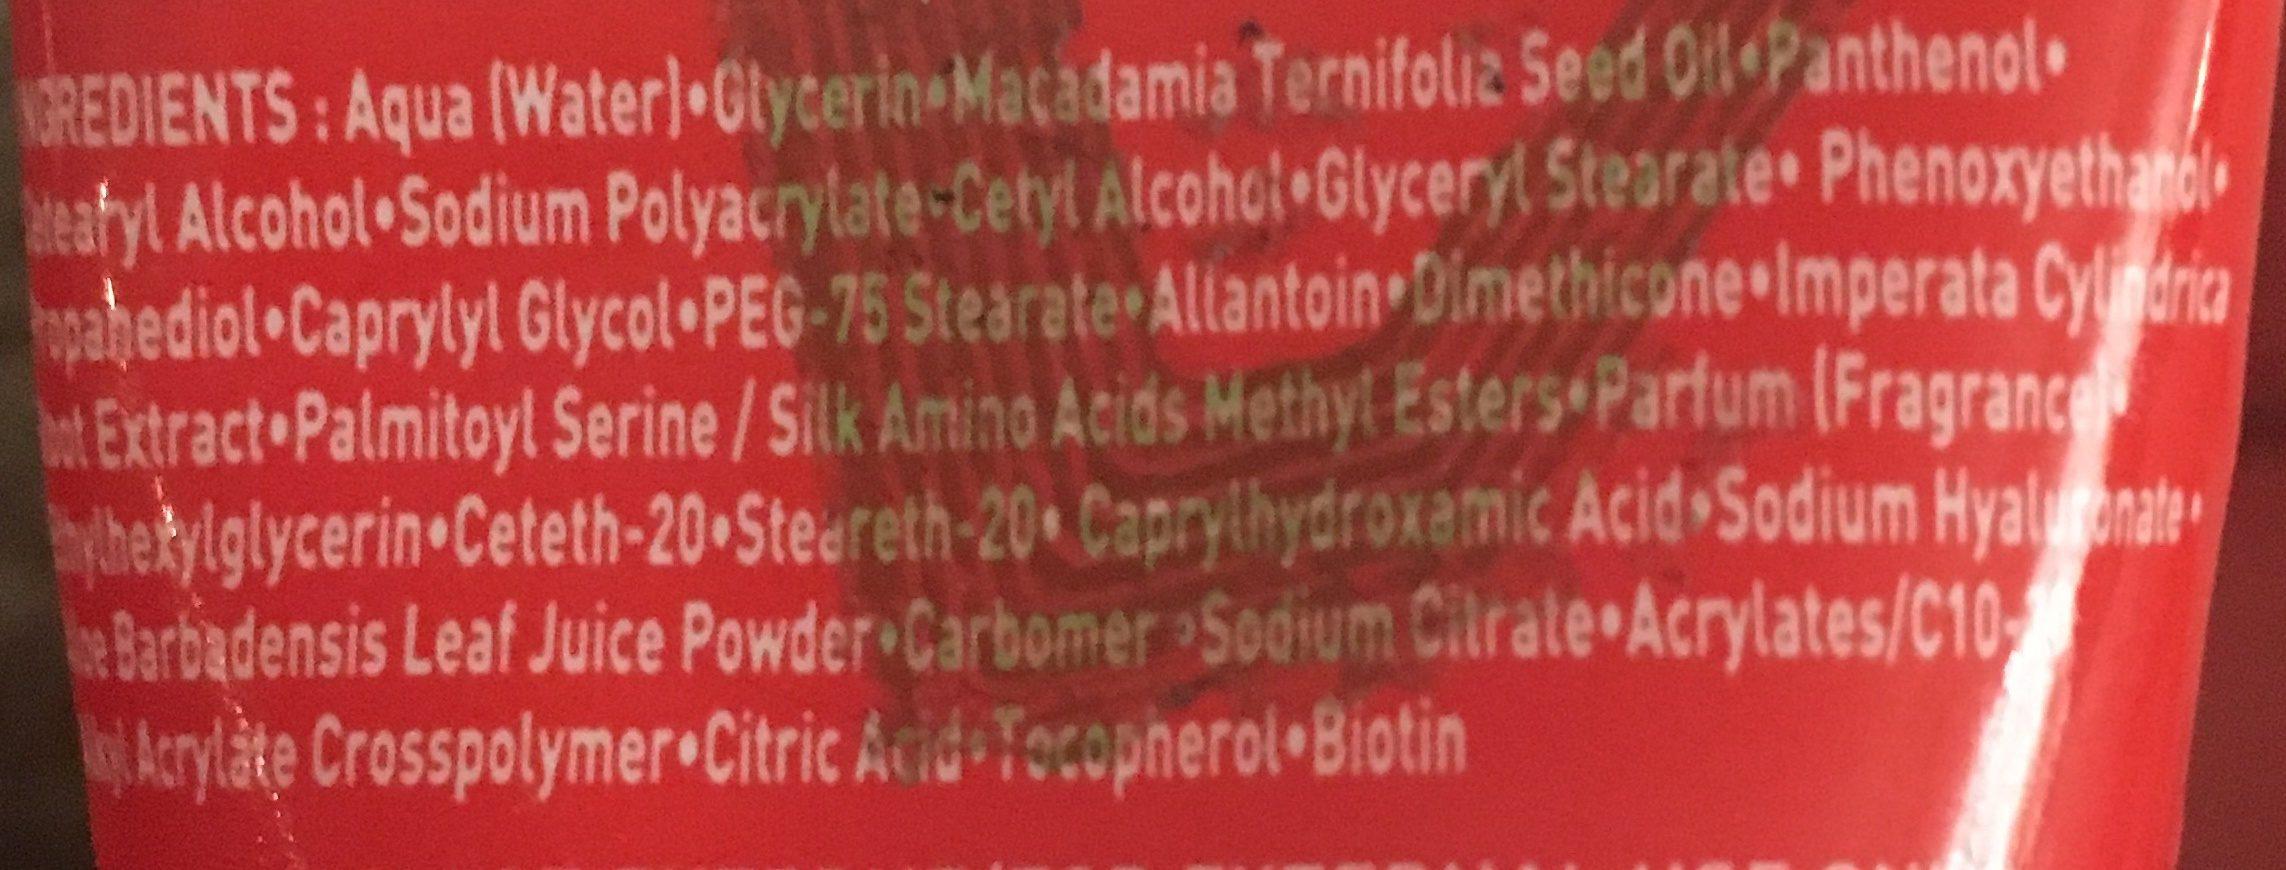 Asepta Vita Citral Soin TR+ - Ingredients - fr